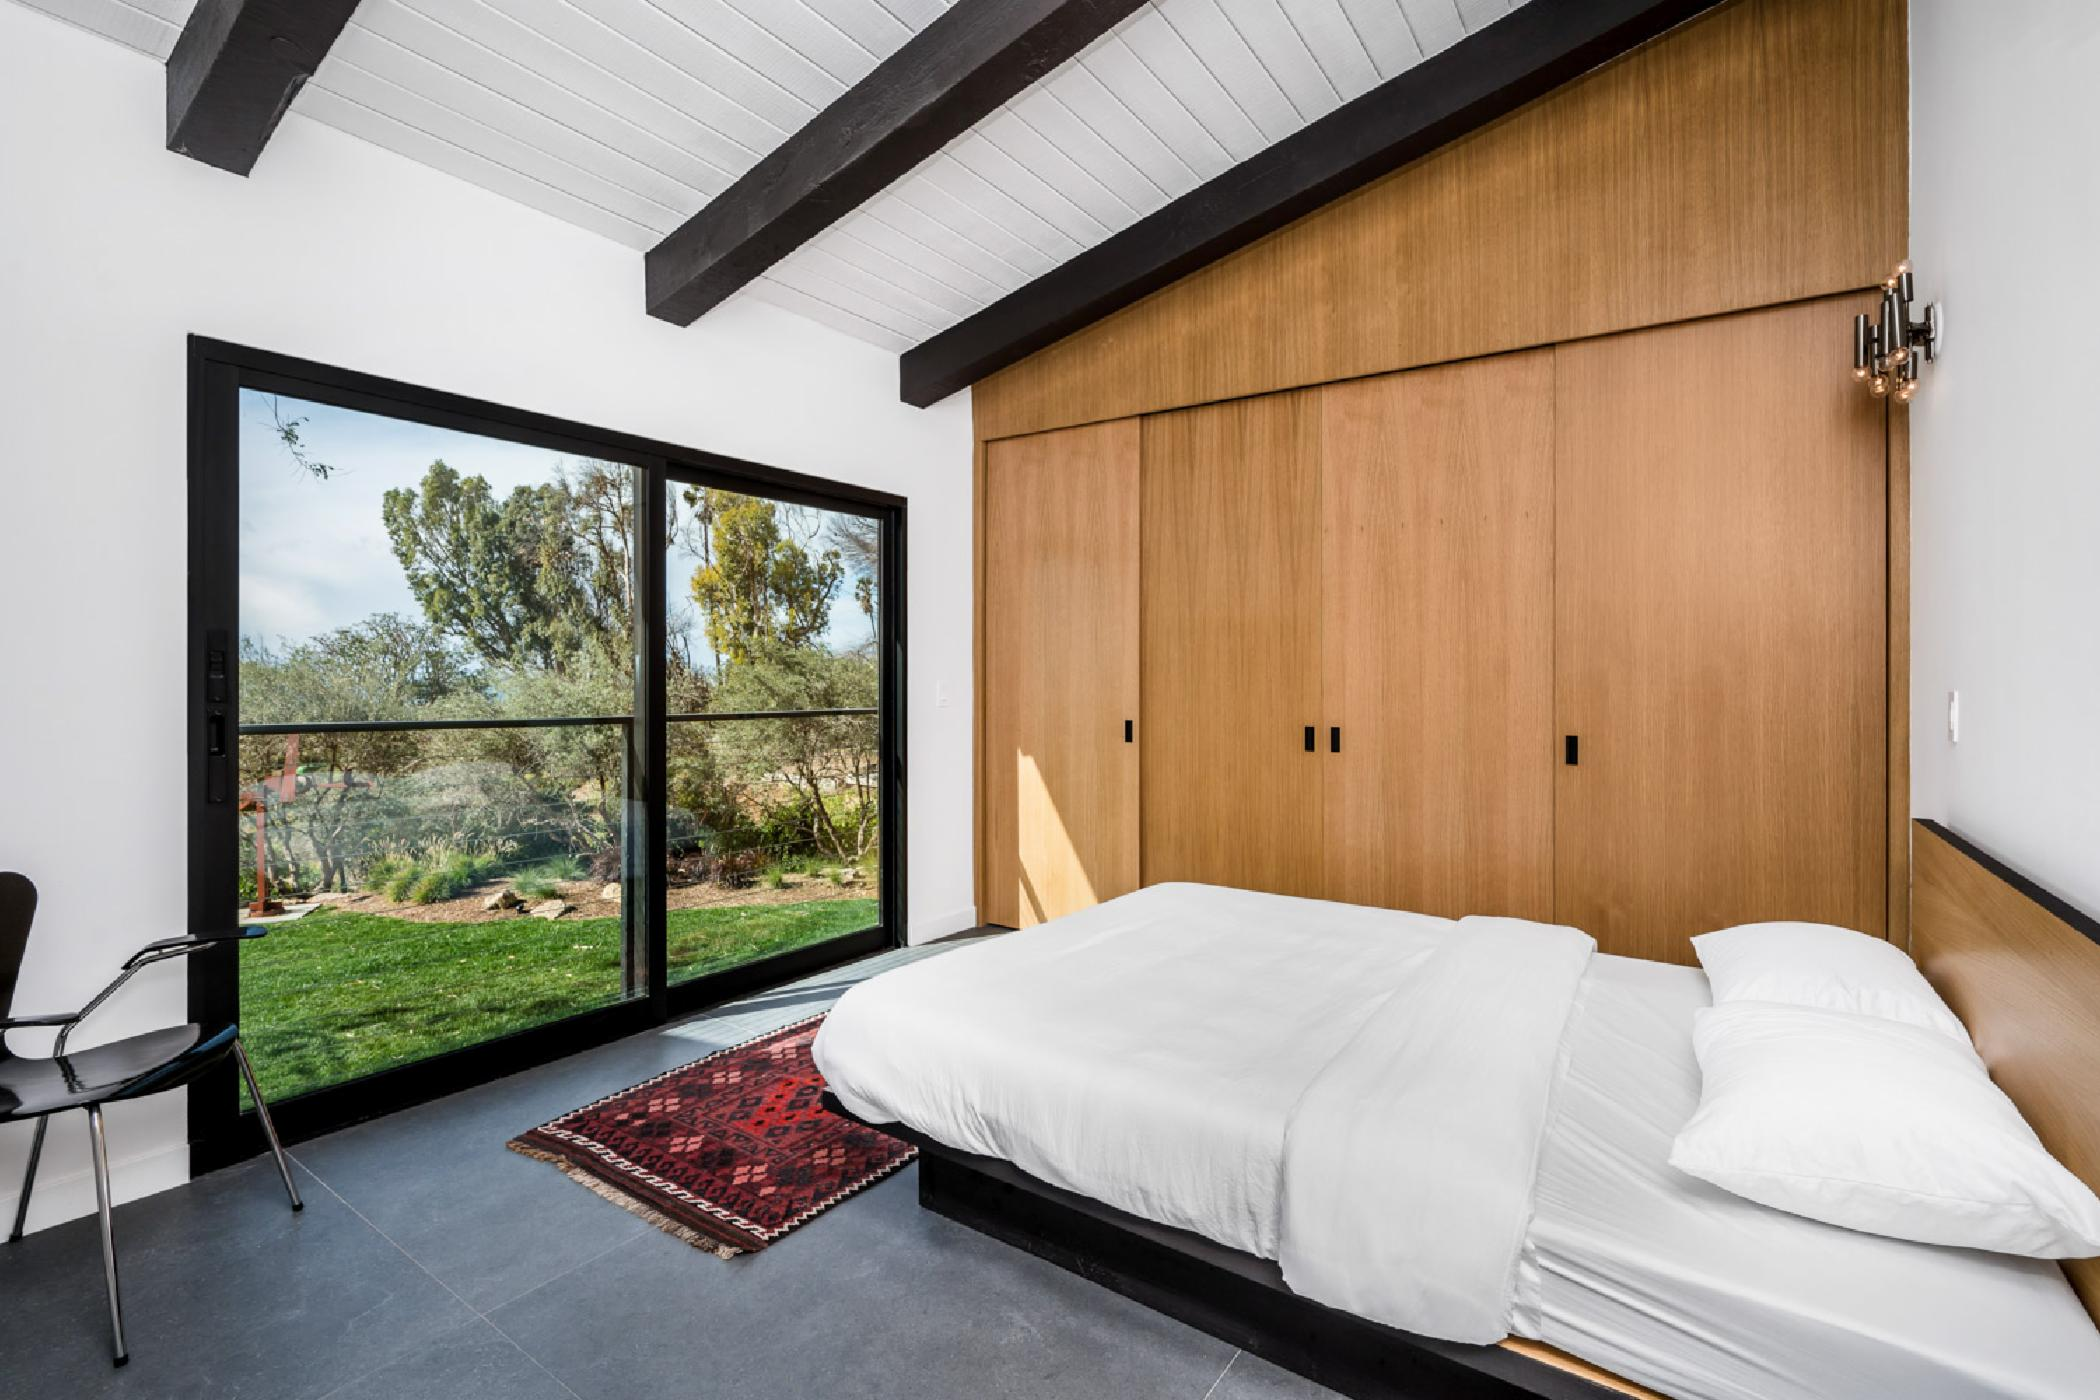 Mainfloor-1bedroom.jpg